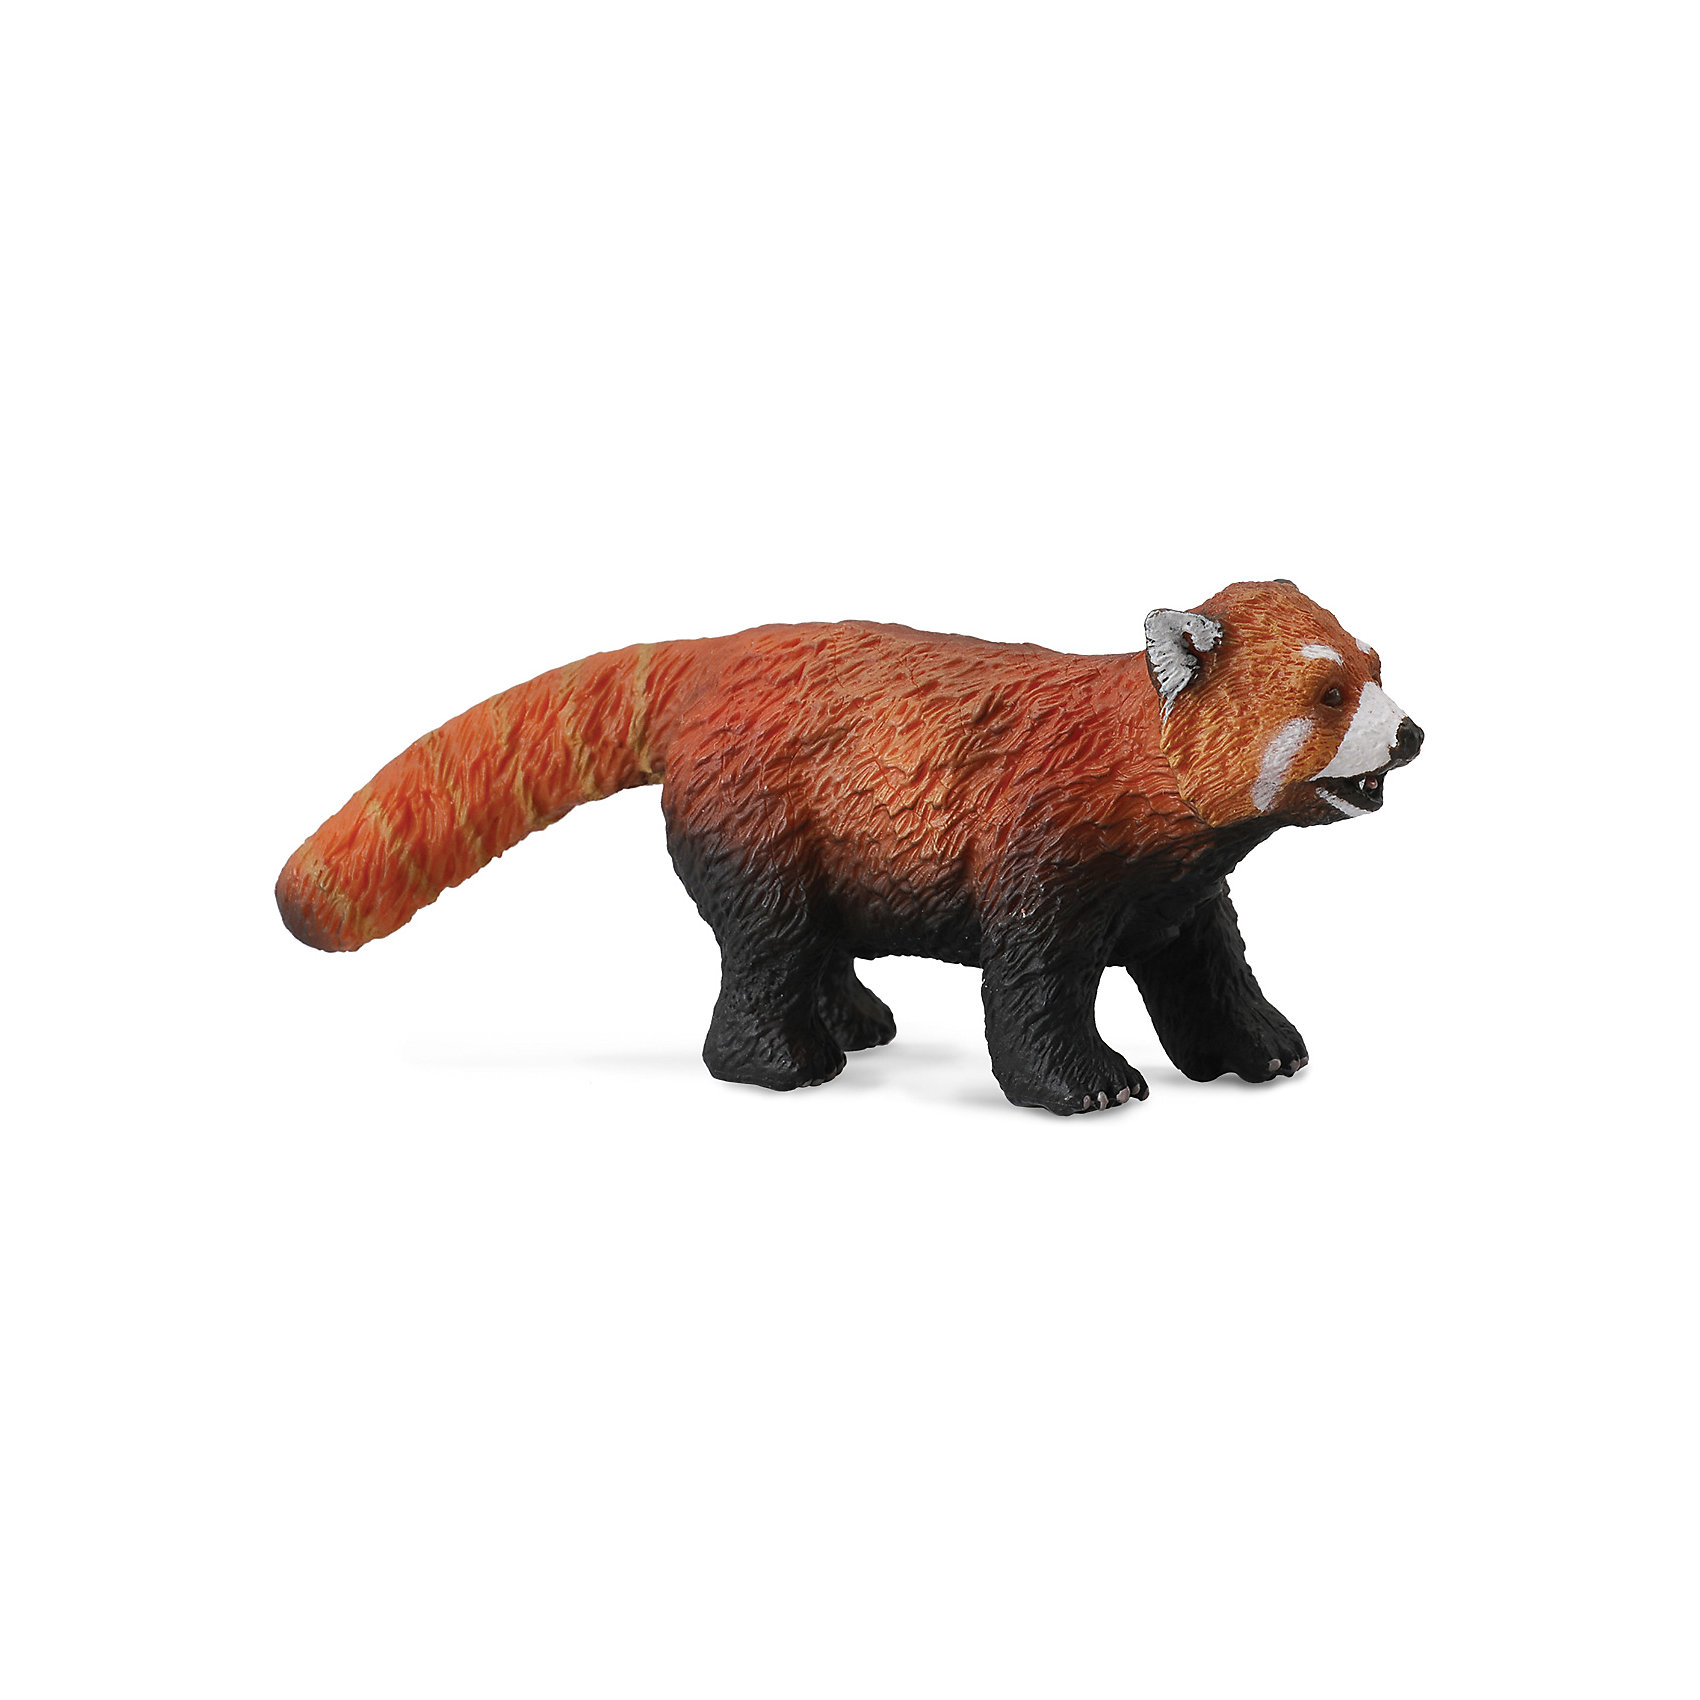 Красная панда, M, CollectaМир животных<br><br><br>Ширина мм: 200<br>Глубина мм: 10<br>Высота мм: 10<br>Вес г: 51<br>Возраст от месяцев: 36<br>Возраст до месяцев: 192<br>Пол: Унисекс<br>Возраст: Детский<br>SKU: 5534518